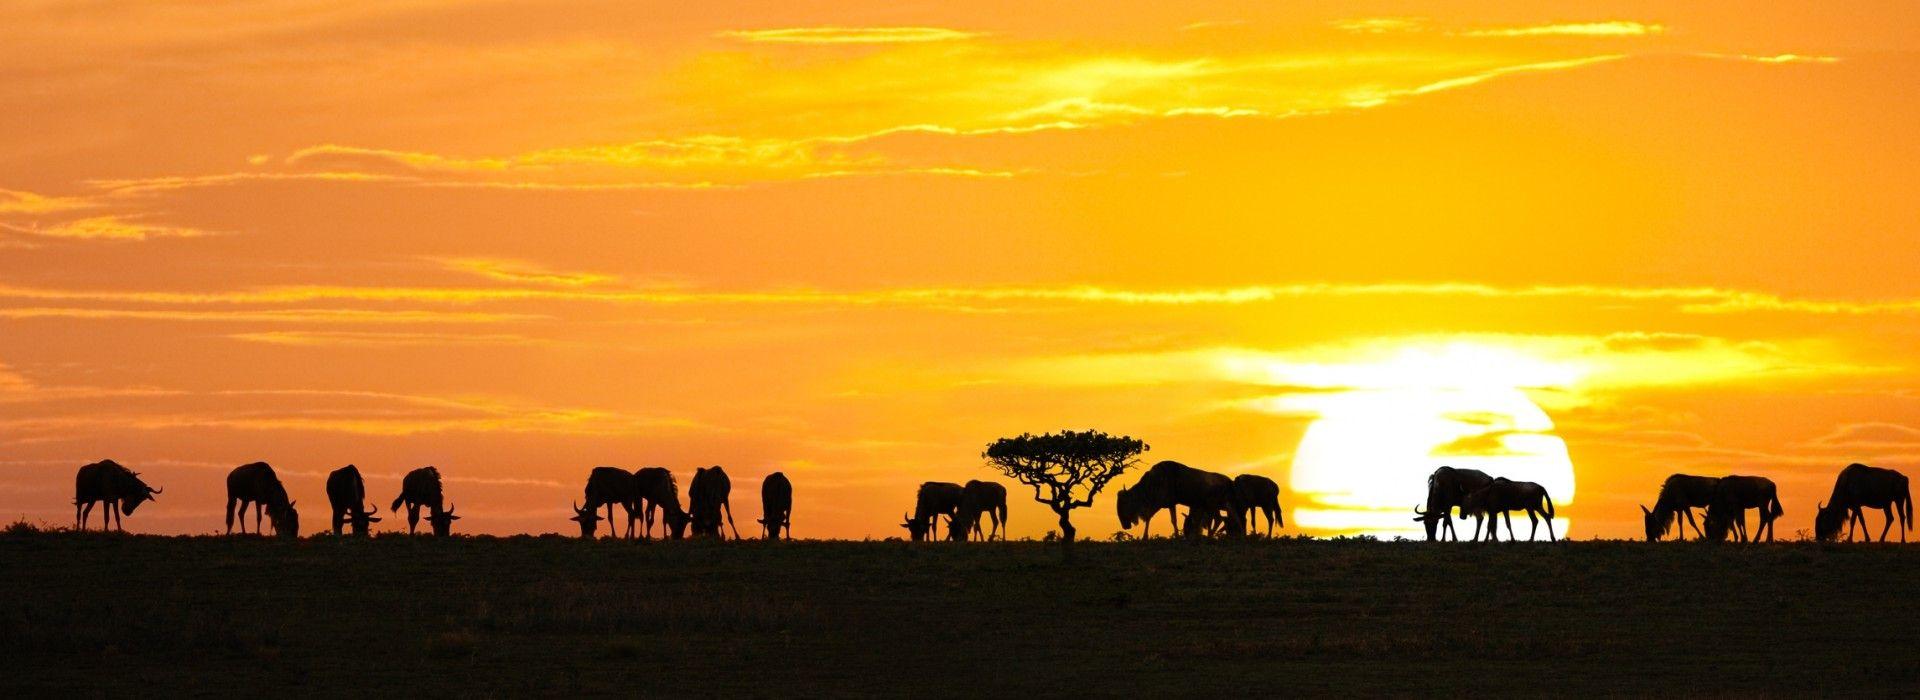 National parks Tours in Zanzibar